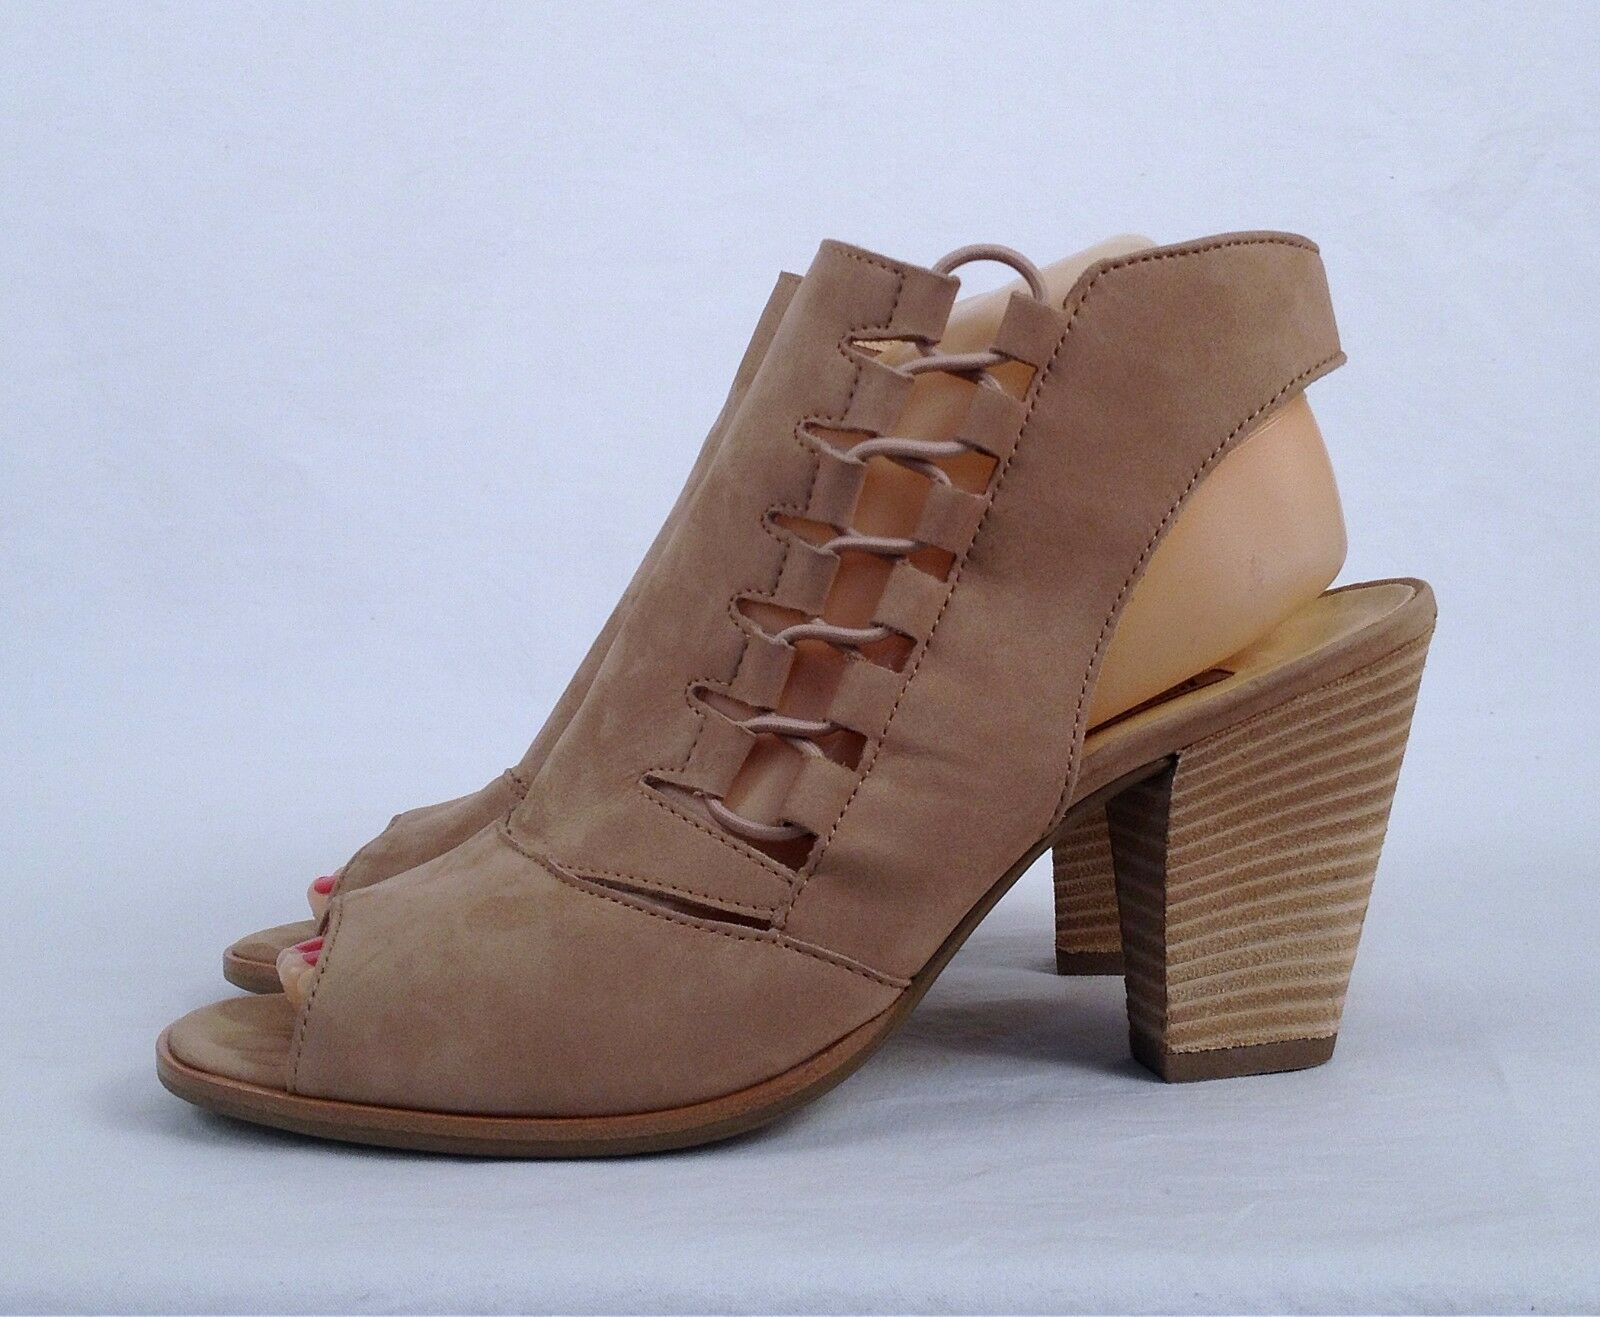 Paul Green 'Mindy' Sandal- Natural- Size 8.5 US/ 6 UK   (B40)